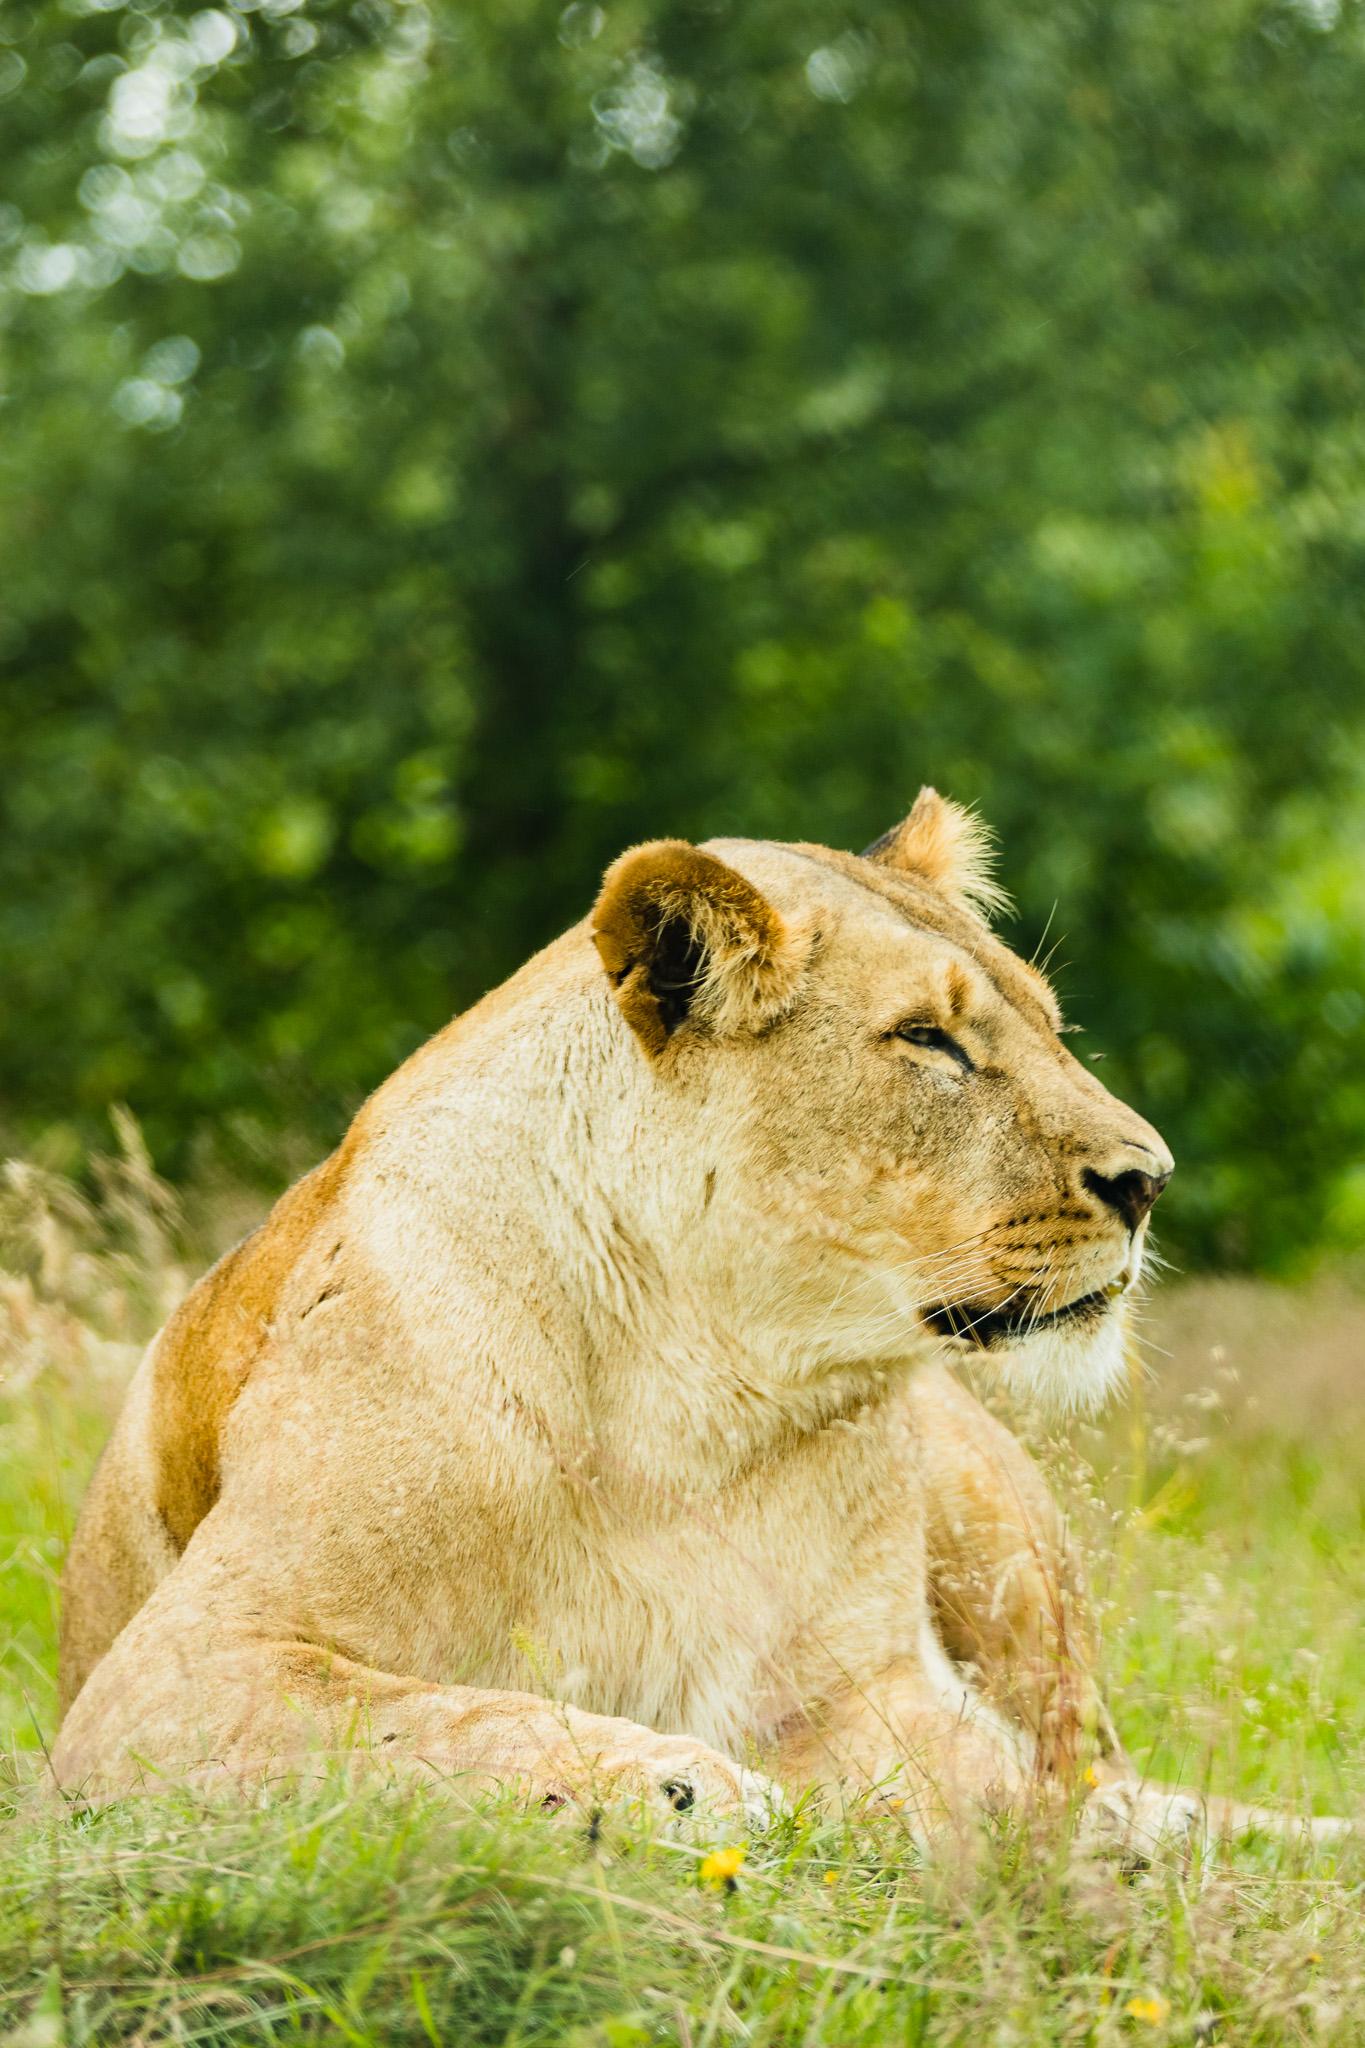 Givskud-Zoo-Safari-NorthernWorkshops-19.jpg